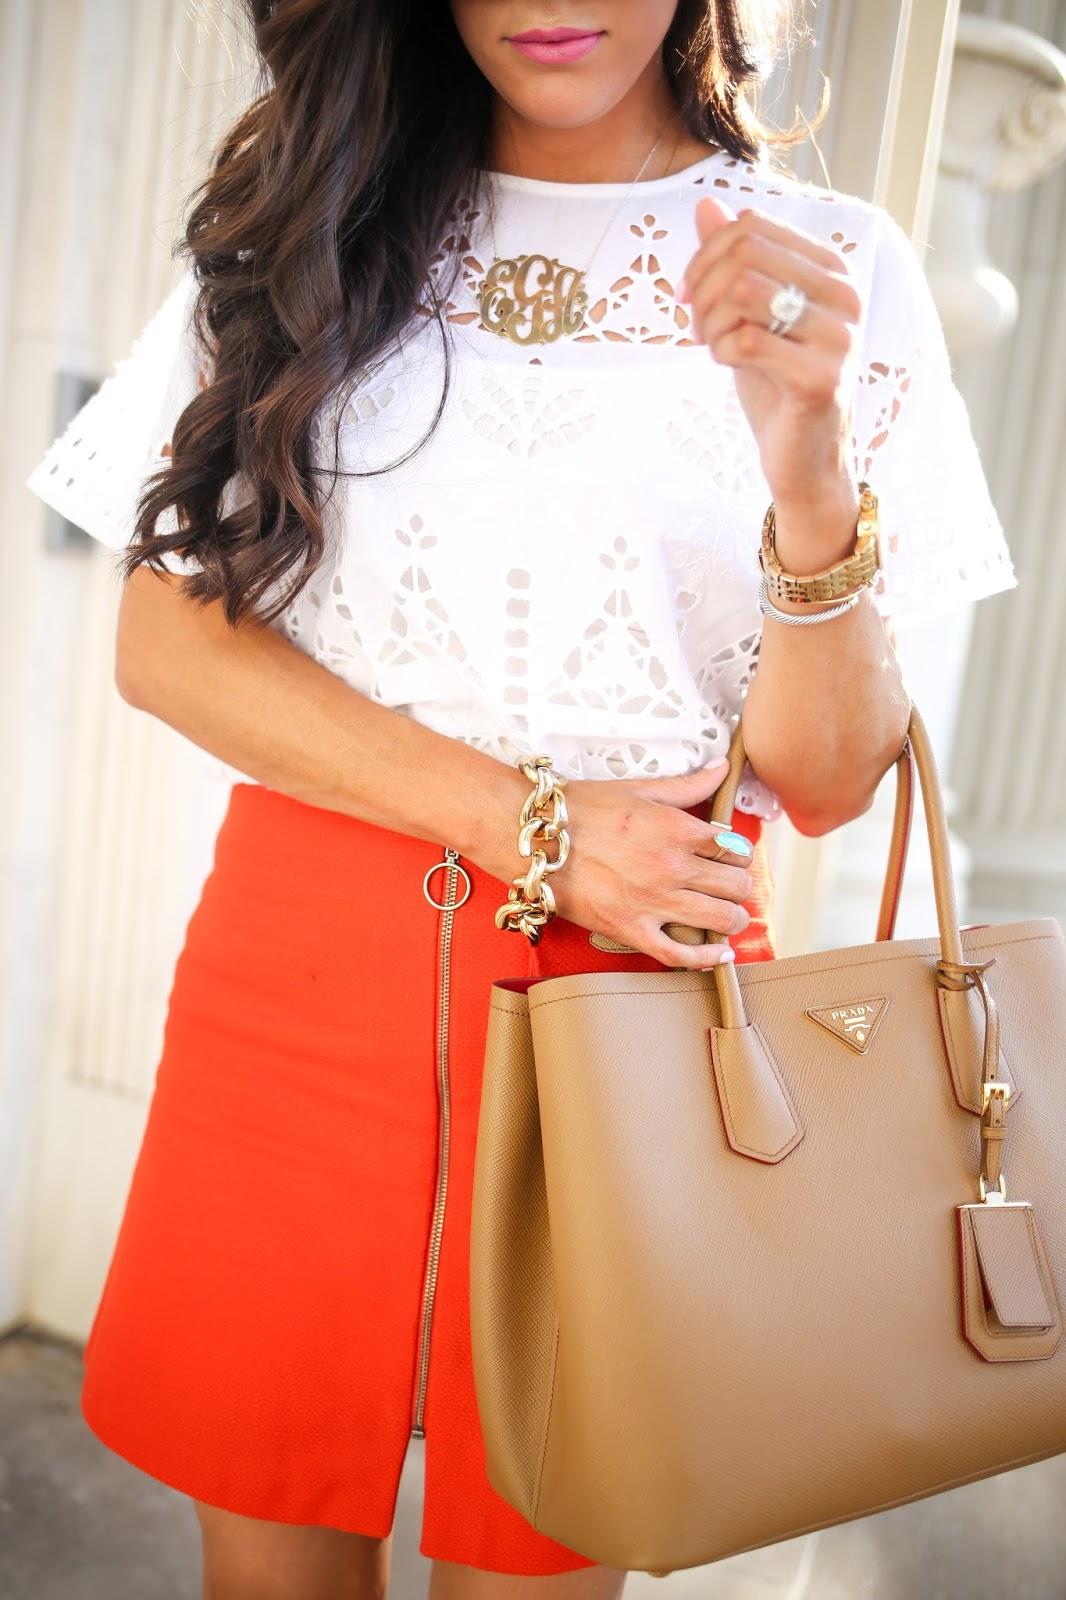 prada satchel - prada orange bag